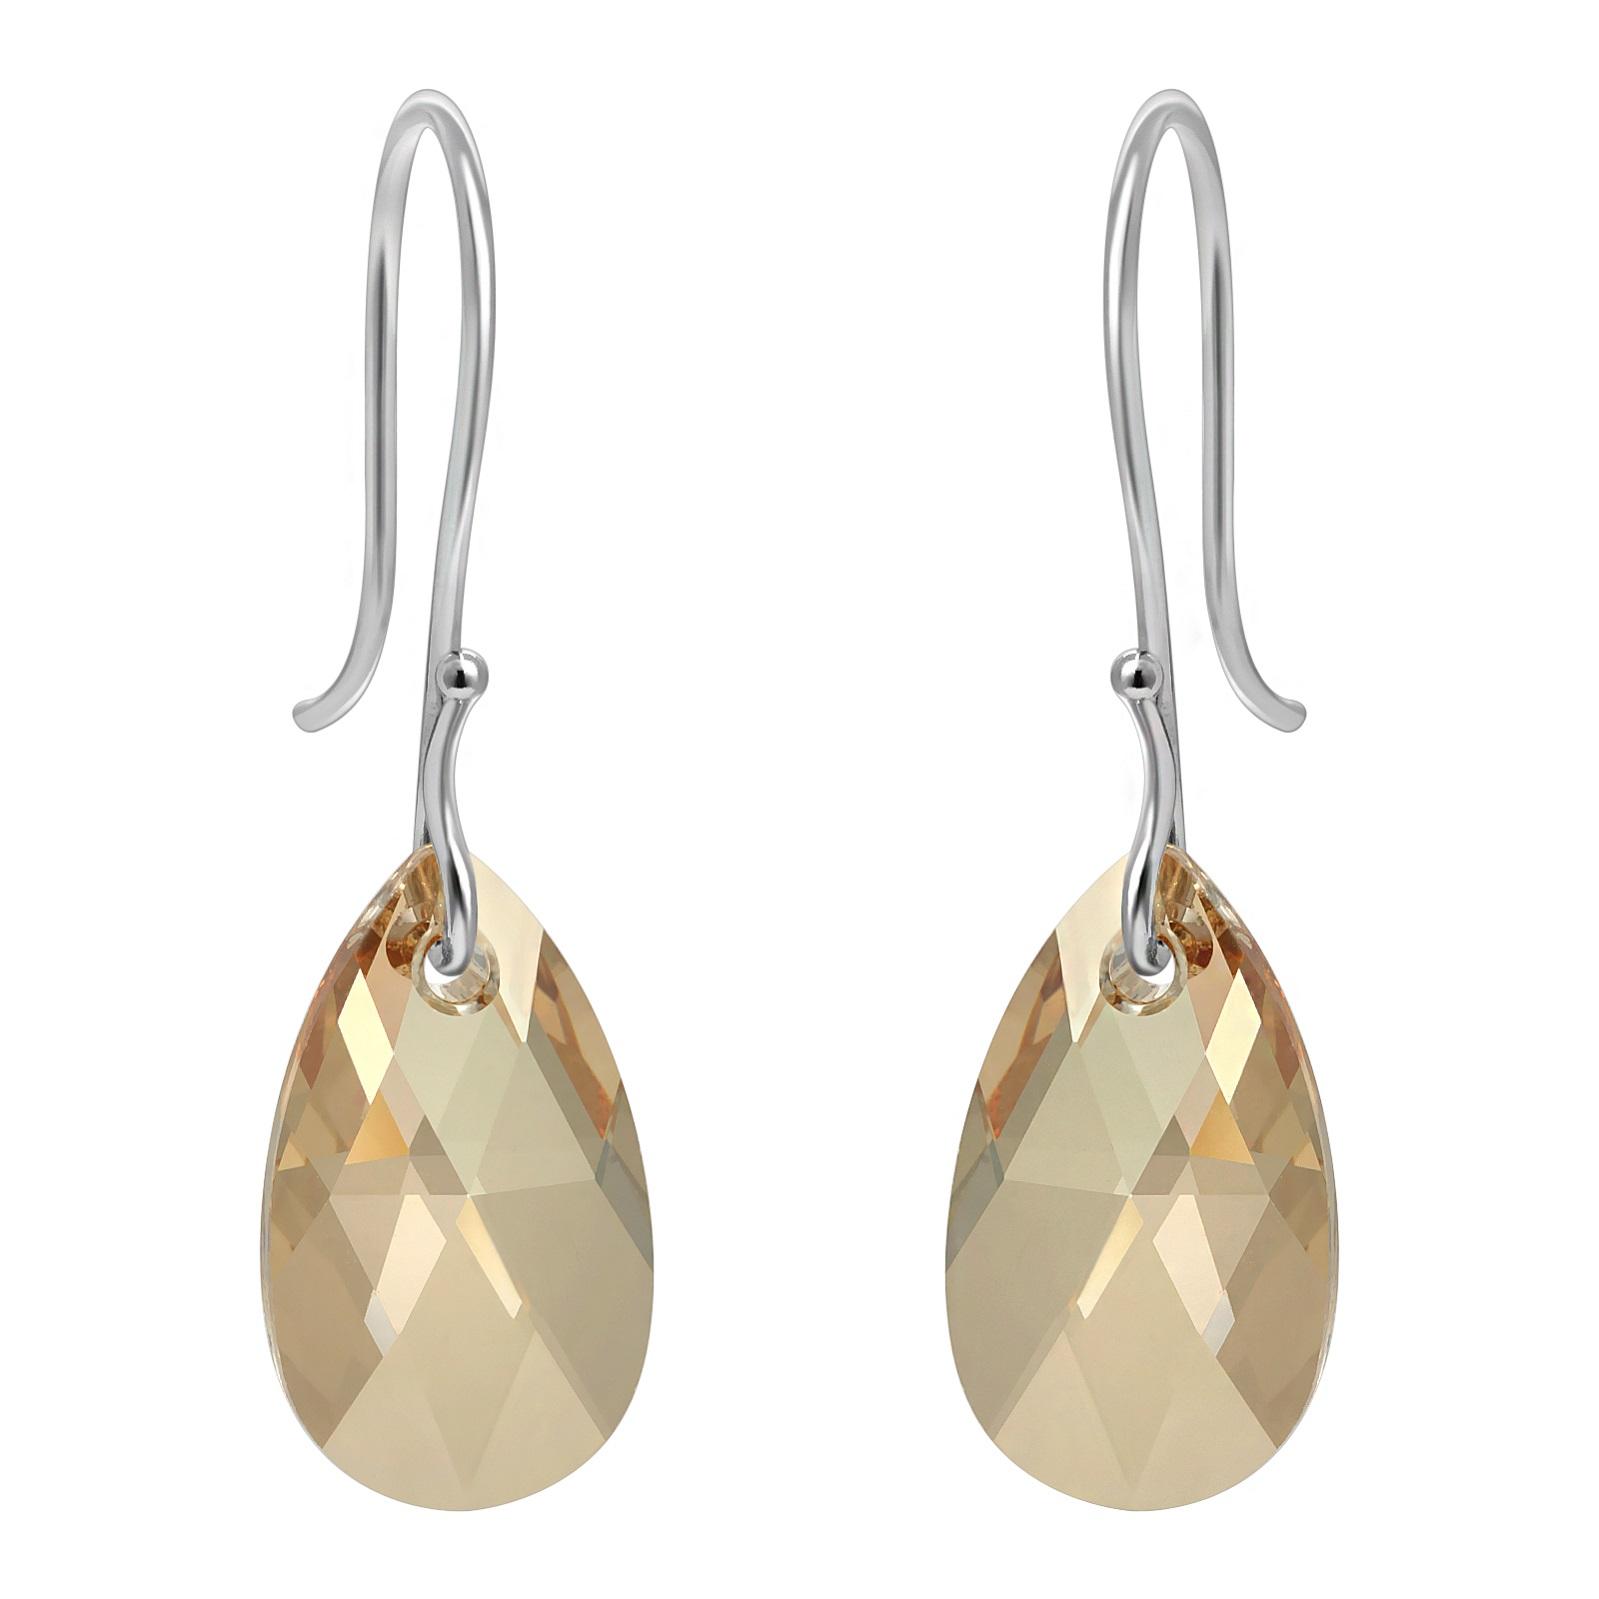 Crystal Briolette Earrings - Swarovski Crystal Elements Golden Shadow